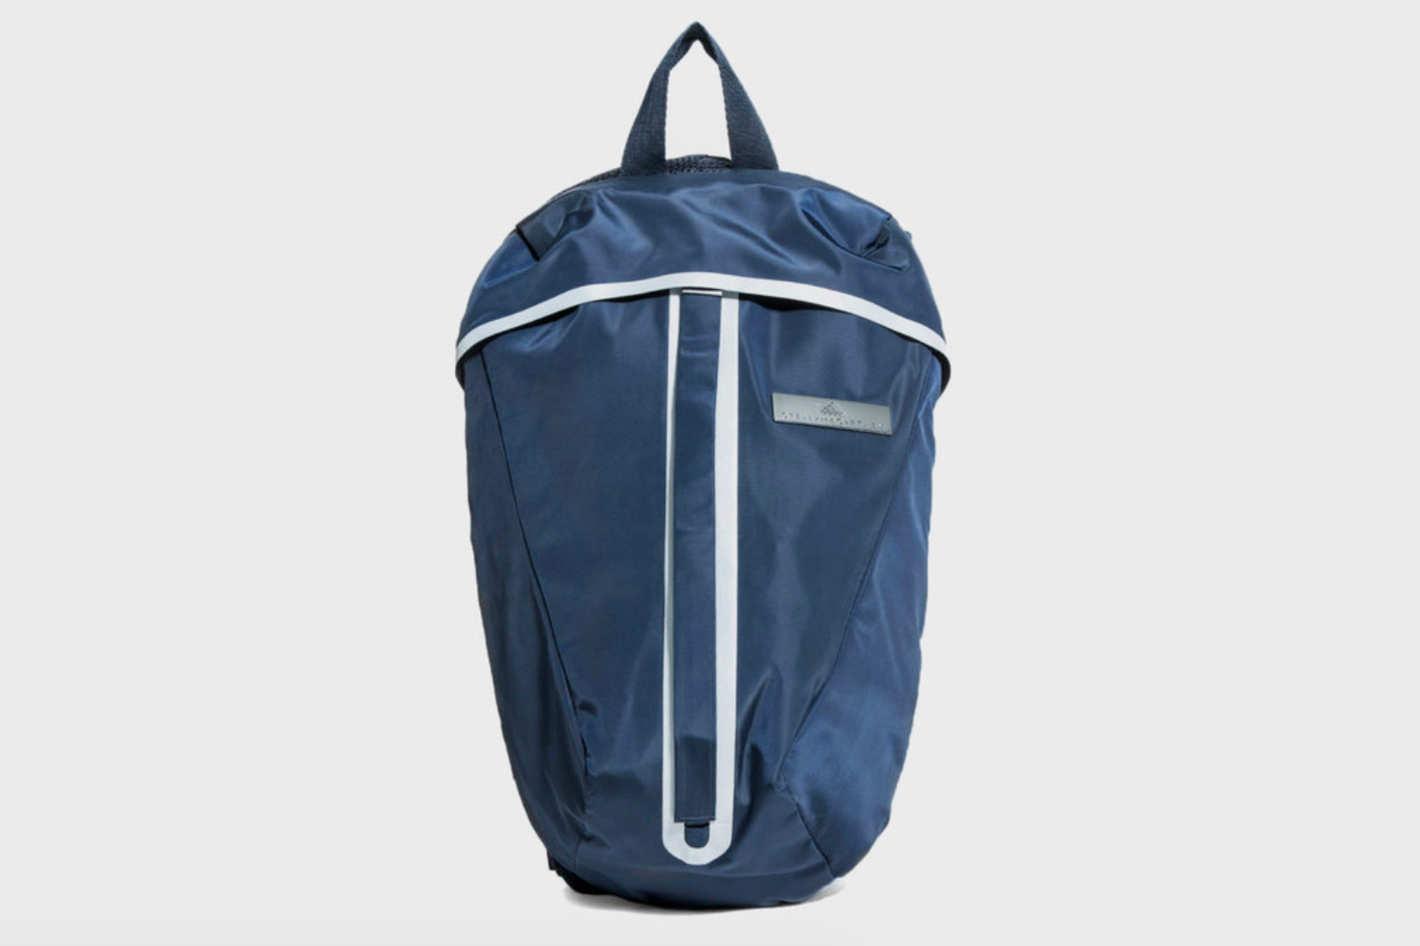 Adidas by Stella McCartney Adizero Running Backpack